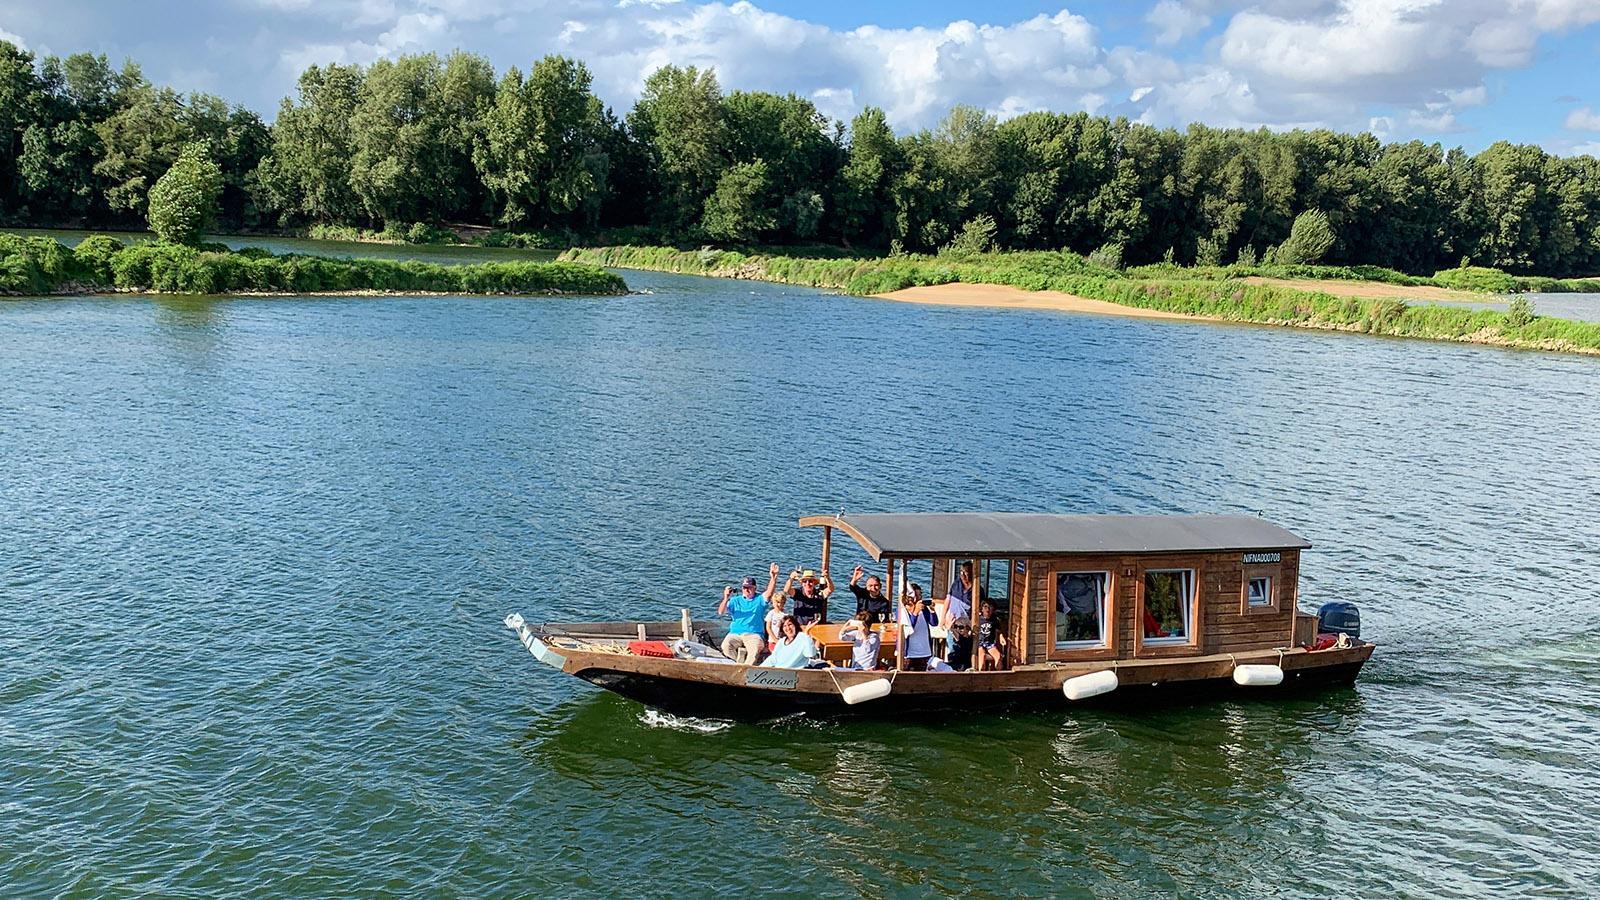 Traditionell flach: die Holzkähne der Loire. Foto: Hilke Maunder